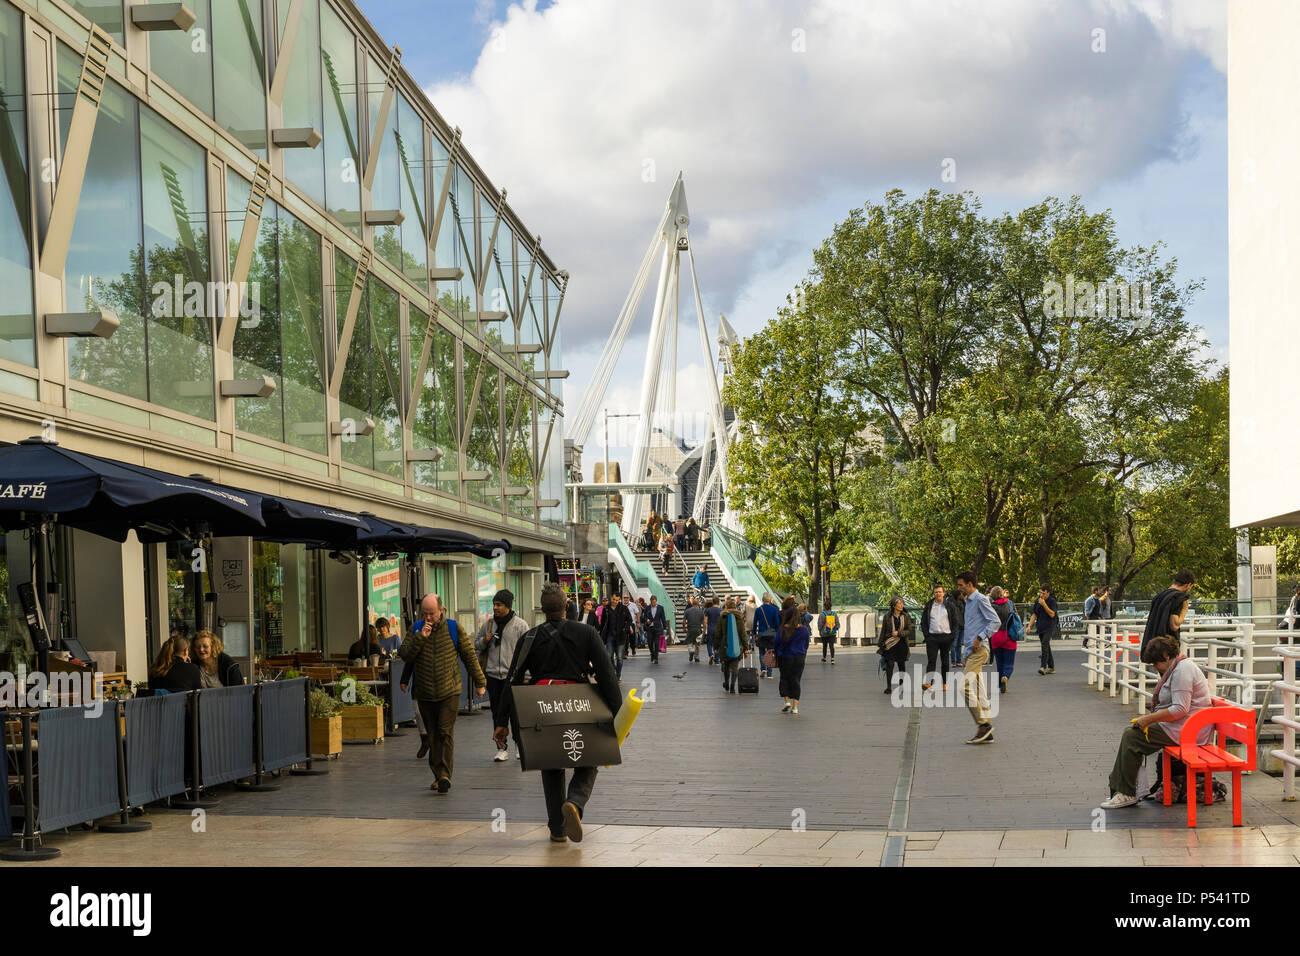 London Great Britain, October 12 2017, People walking on Golden Jubilee Bridge, Nice sunny autumn day in the city Stock Photo